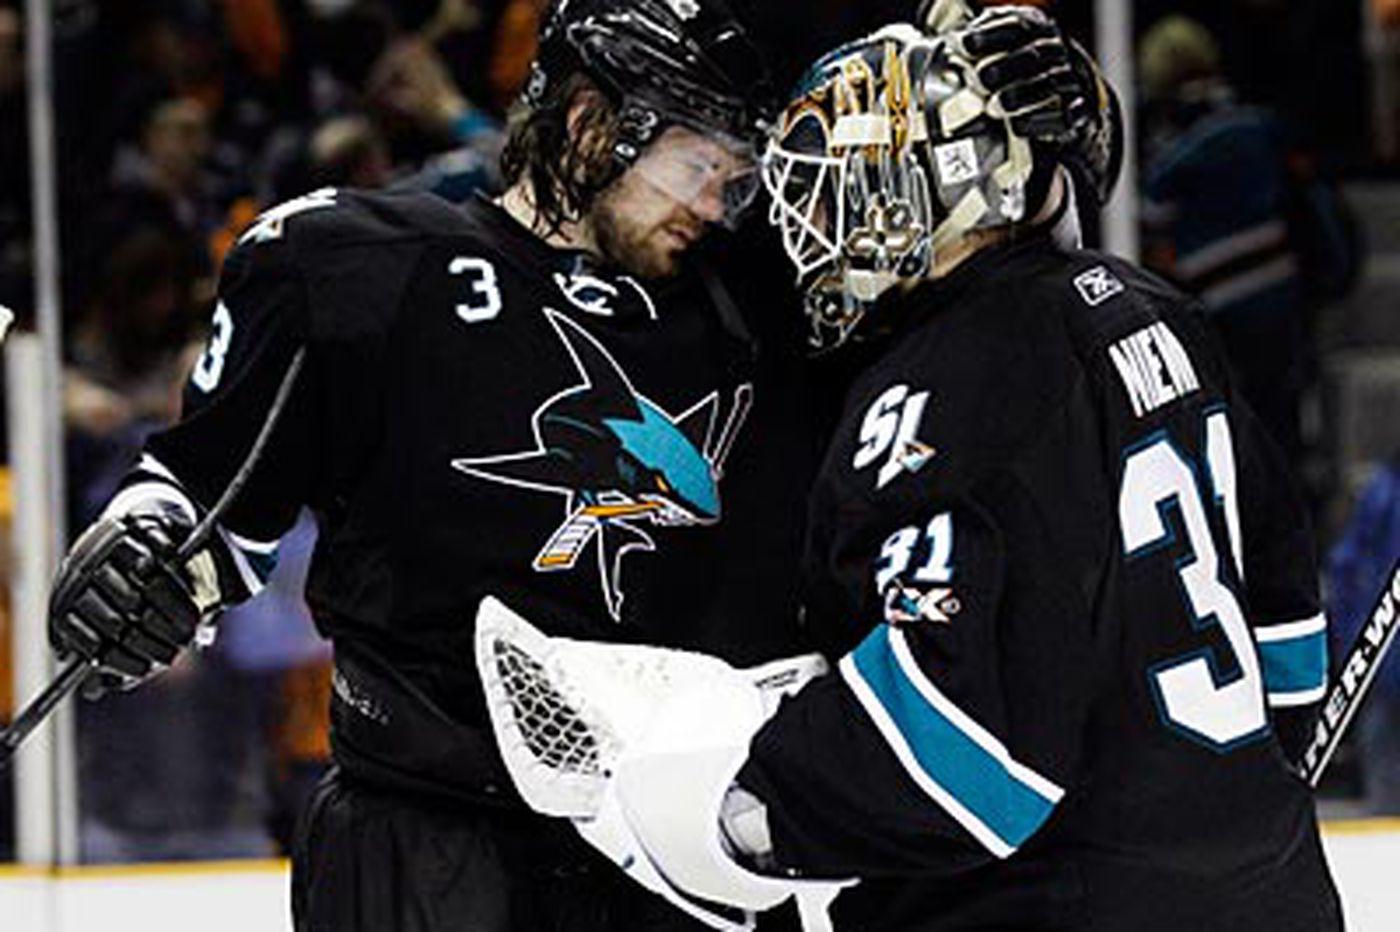 Sharks beat Canucks, Western series at 2-1